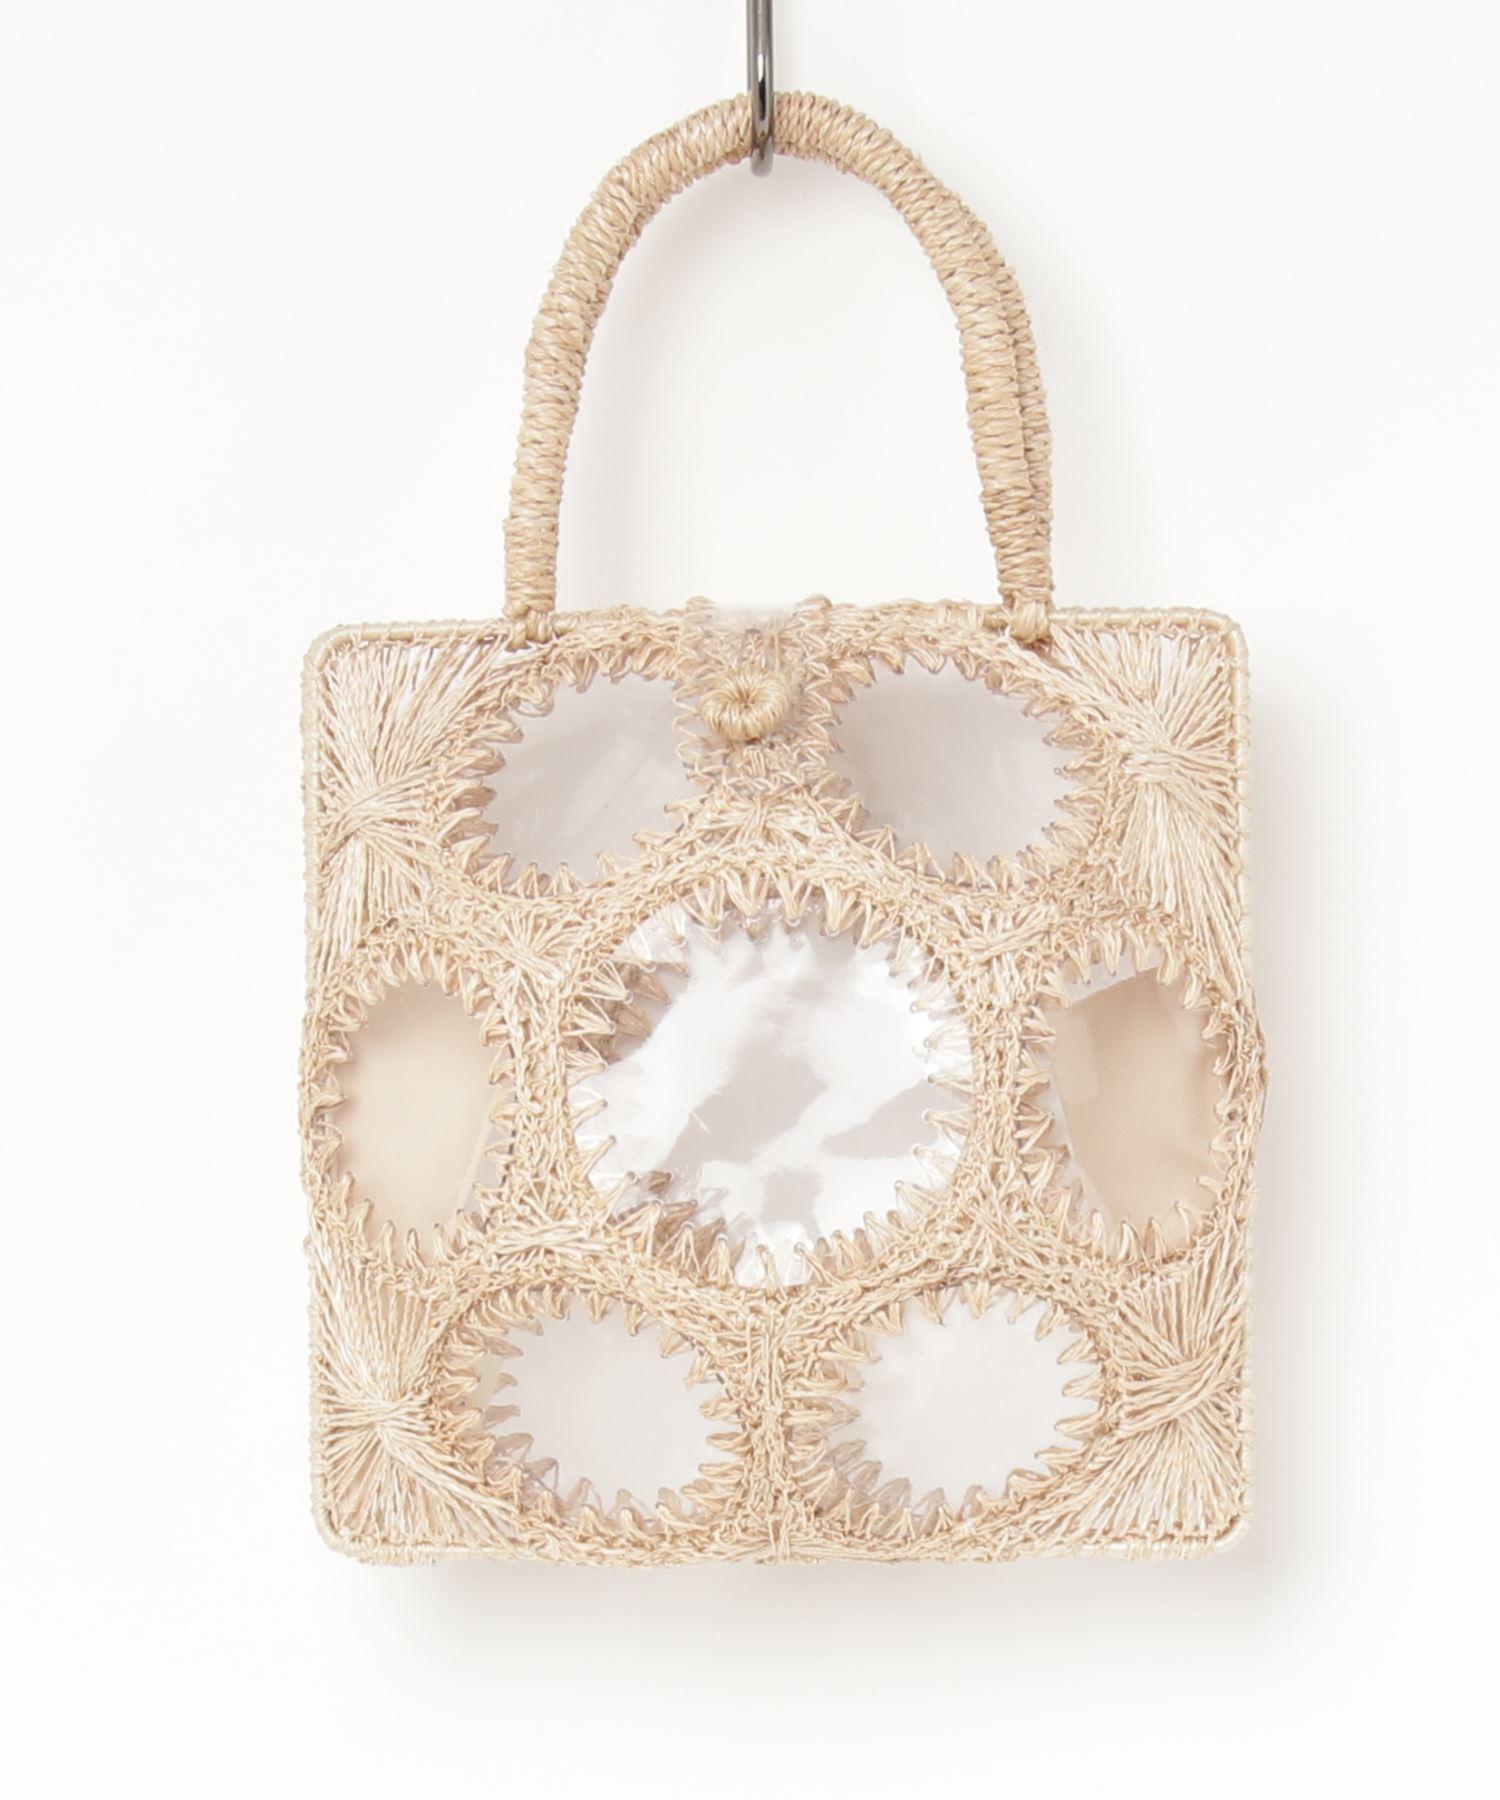 JAMIRAY ジャミレイ / PVCスモールトートバッグ Abaca Clear Basket